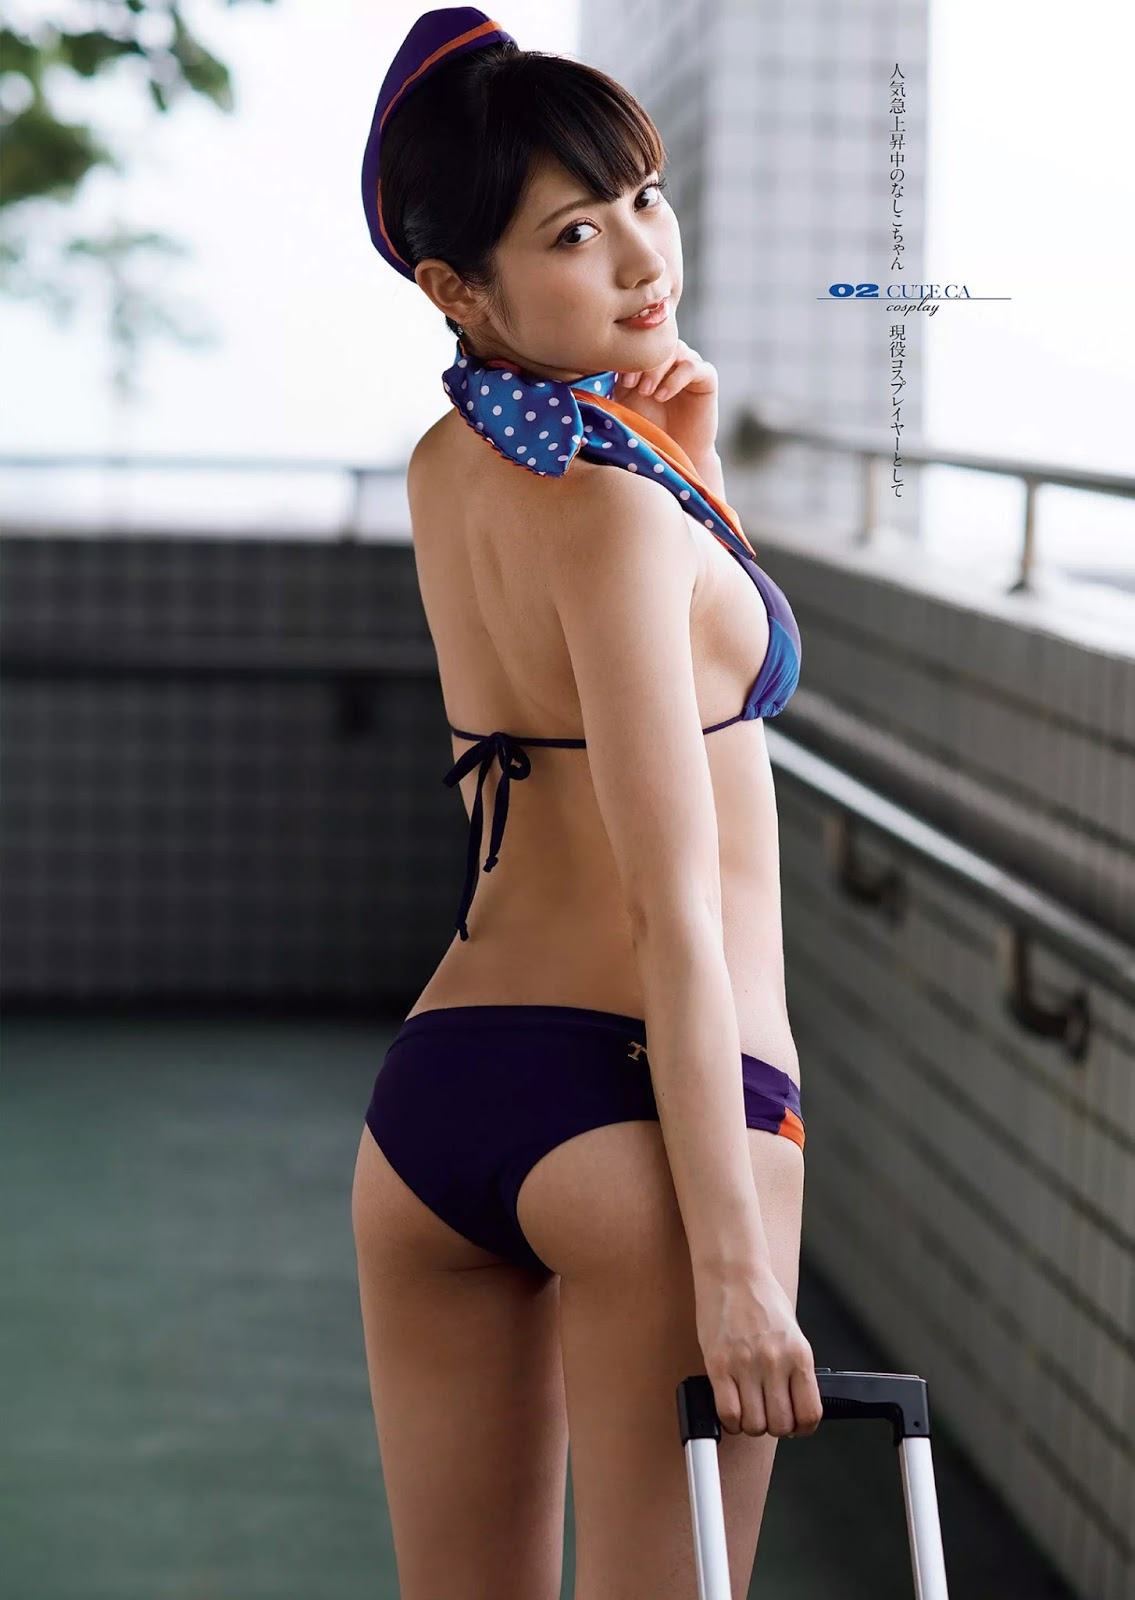 Nashiko Momotsuki 桃月なしこ, Weekly Playboy 2018 No.19-20 (週刊プレイボーイ 2018年19-20号)